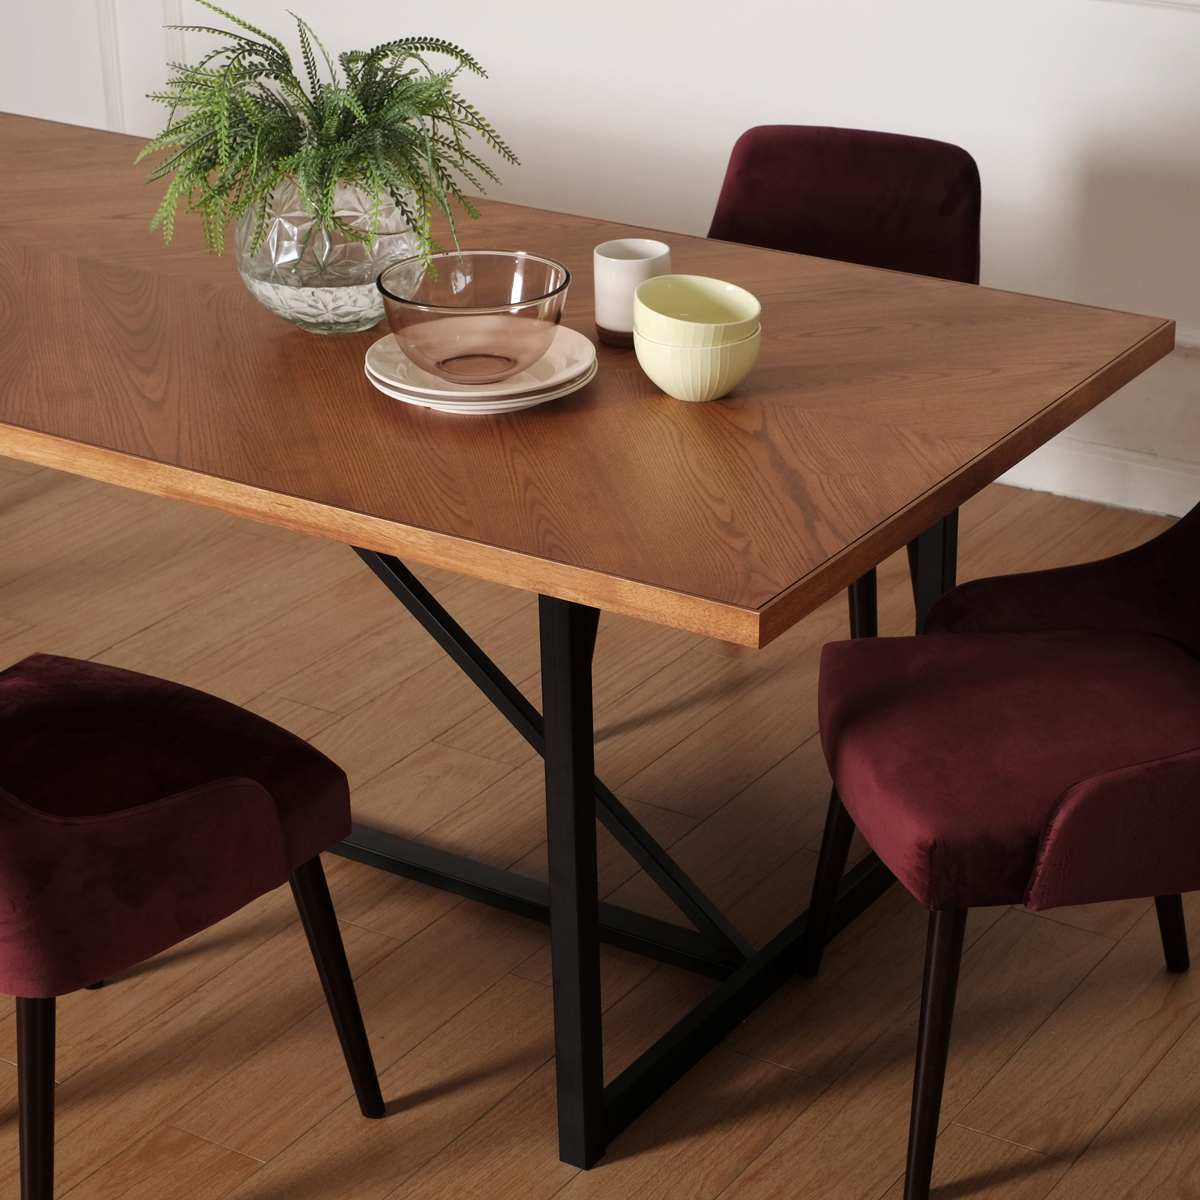 Hudson Chevron Dining Table 240cm Ruma, Hudson Dining Room Furniture